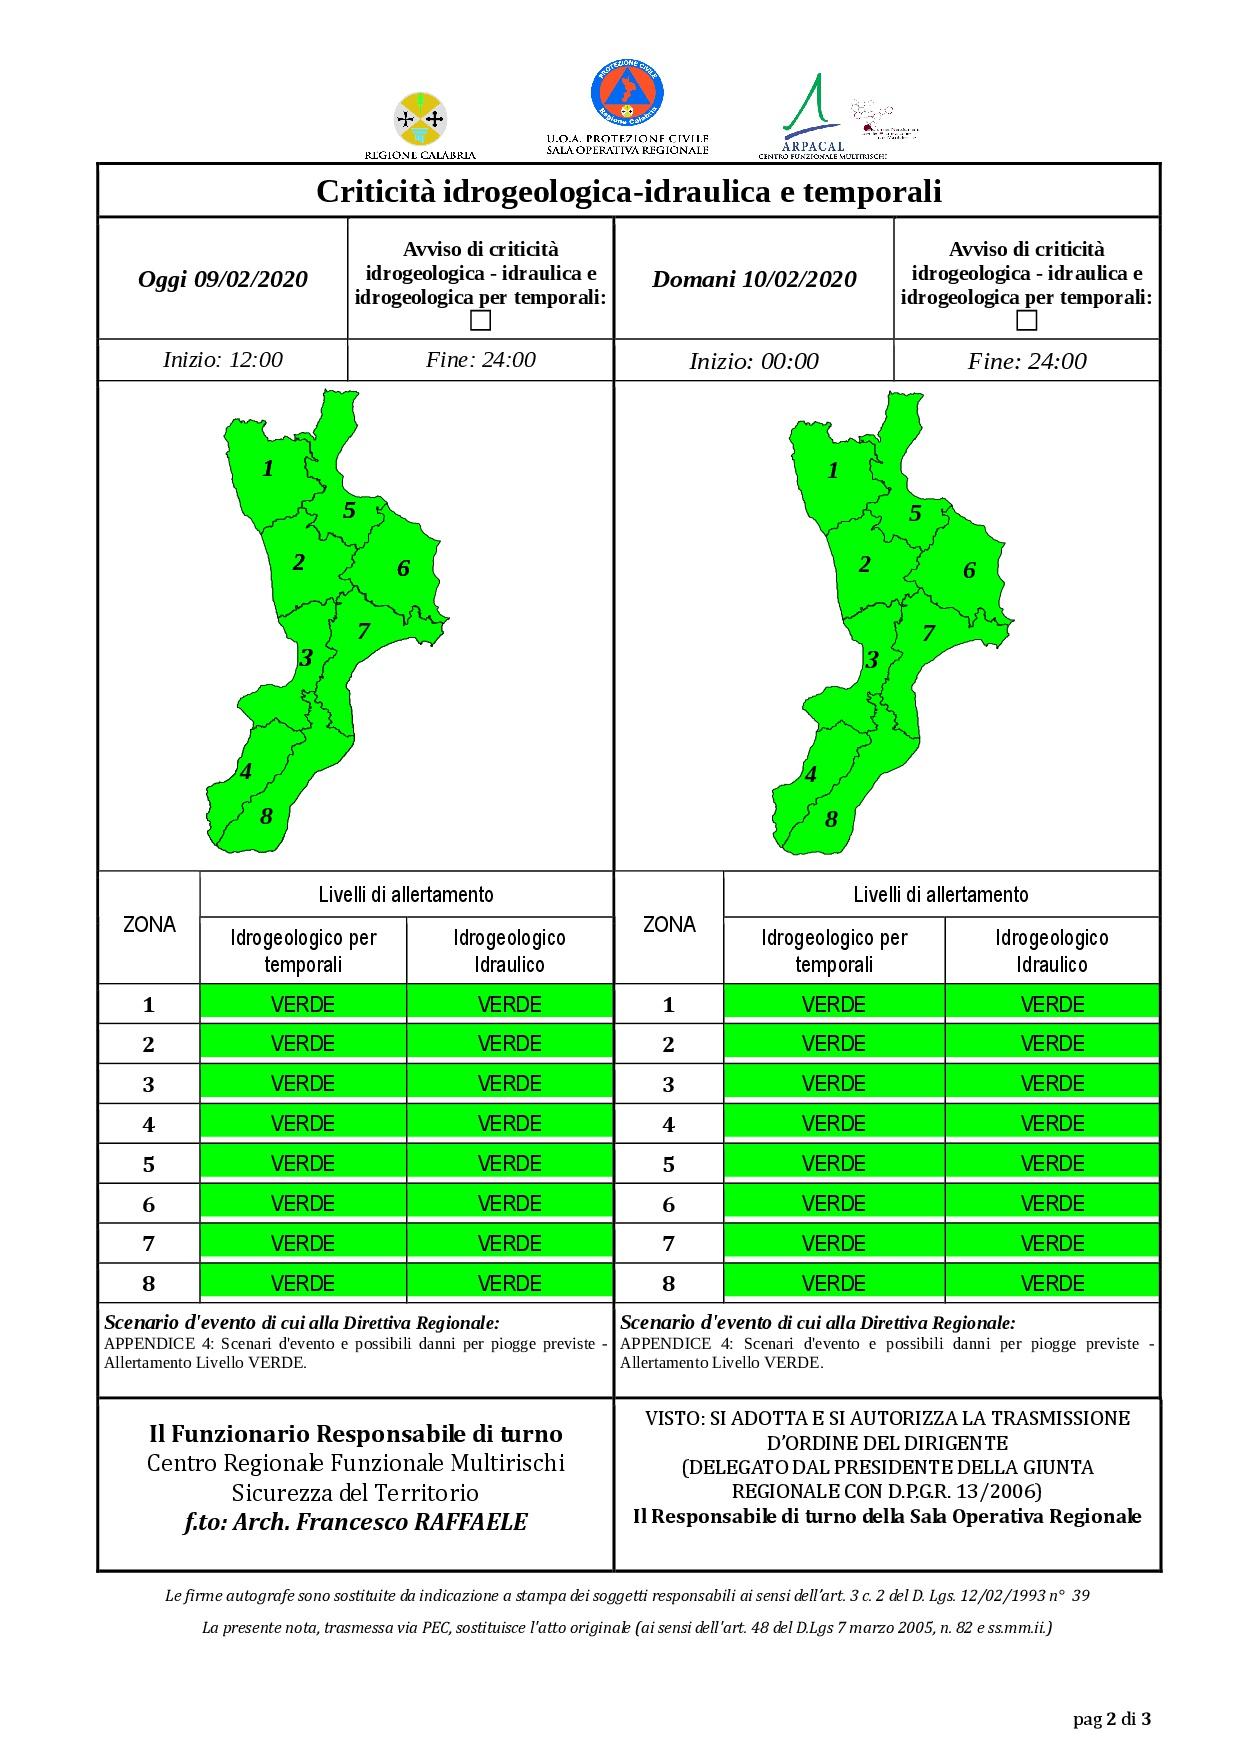 Criticità idrogeologica-idraulica e temporali in Calabria 09-02-2020